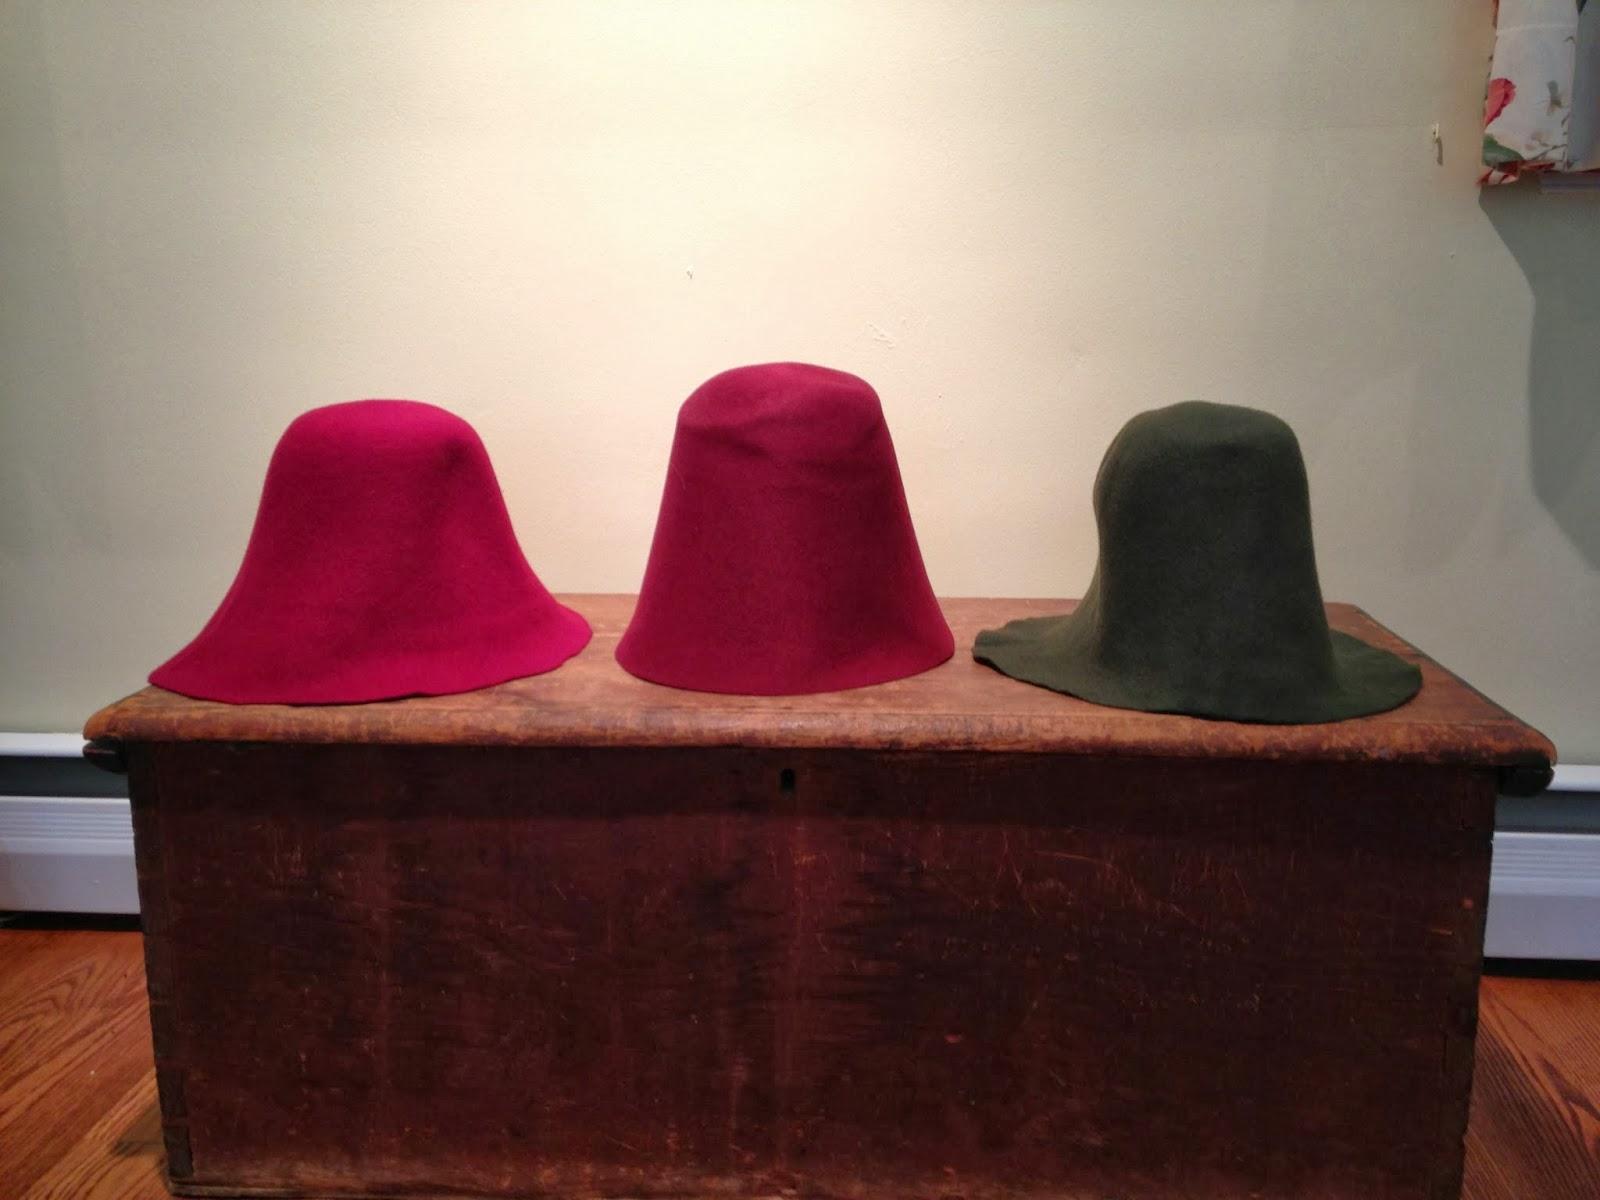 eeedf635953 A Commonplace Book  Hatmaking